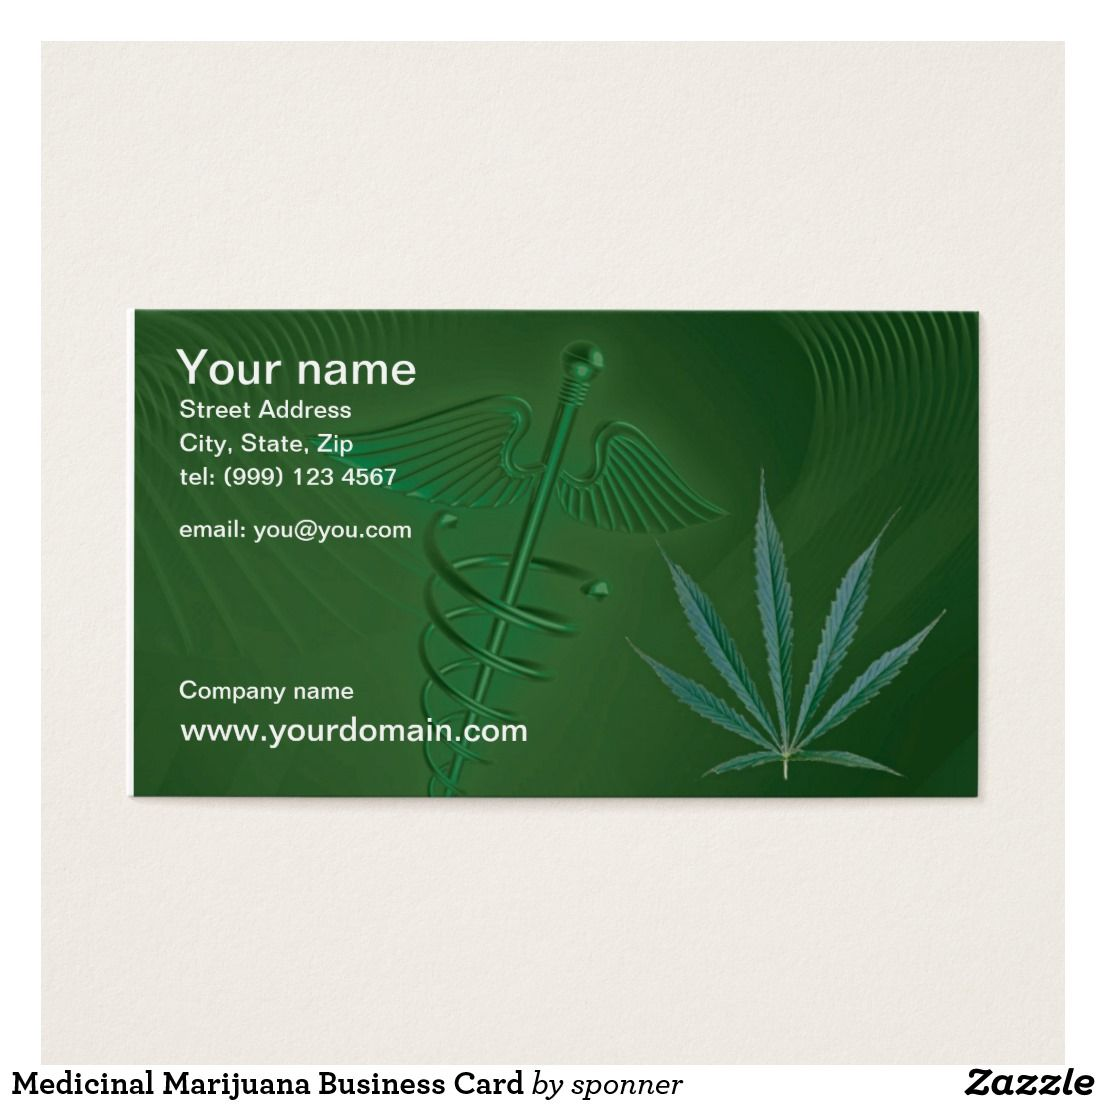 Marijuana business cards image collections free business cards medicinal marijuana business card check out more business card medicinal marijuana business card check out more magicingreecefo Choice Image